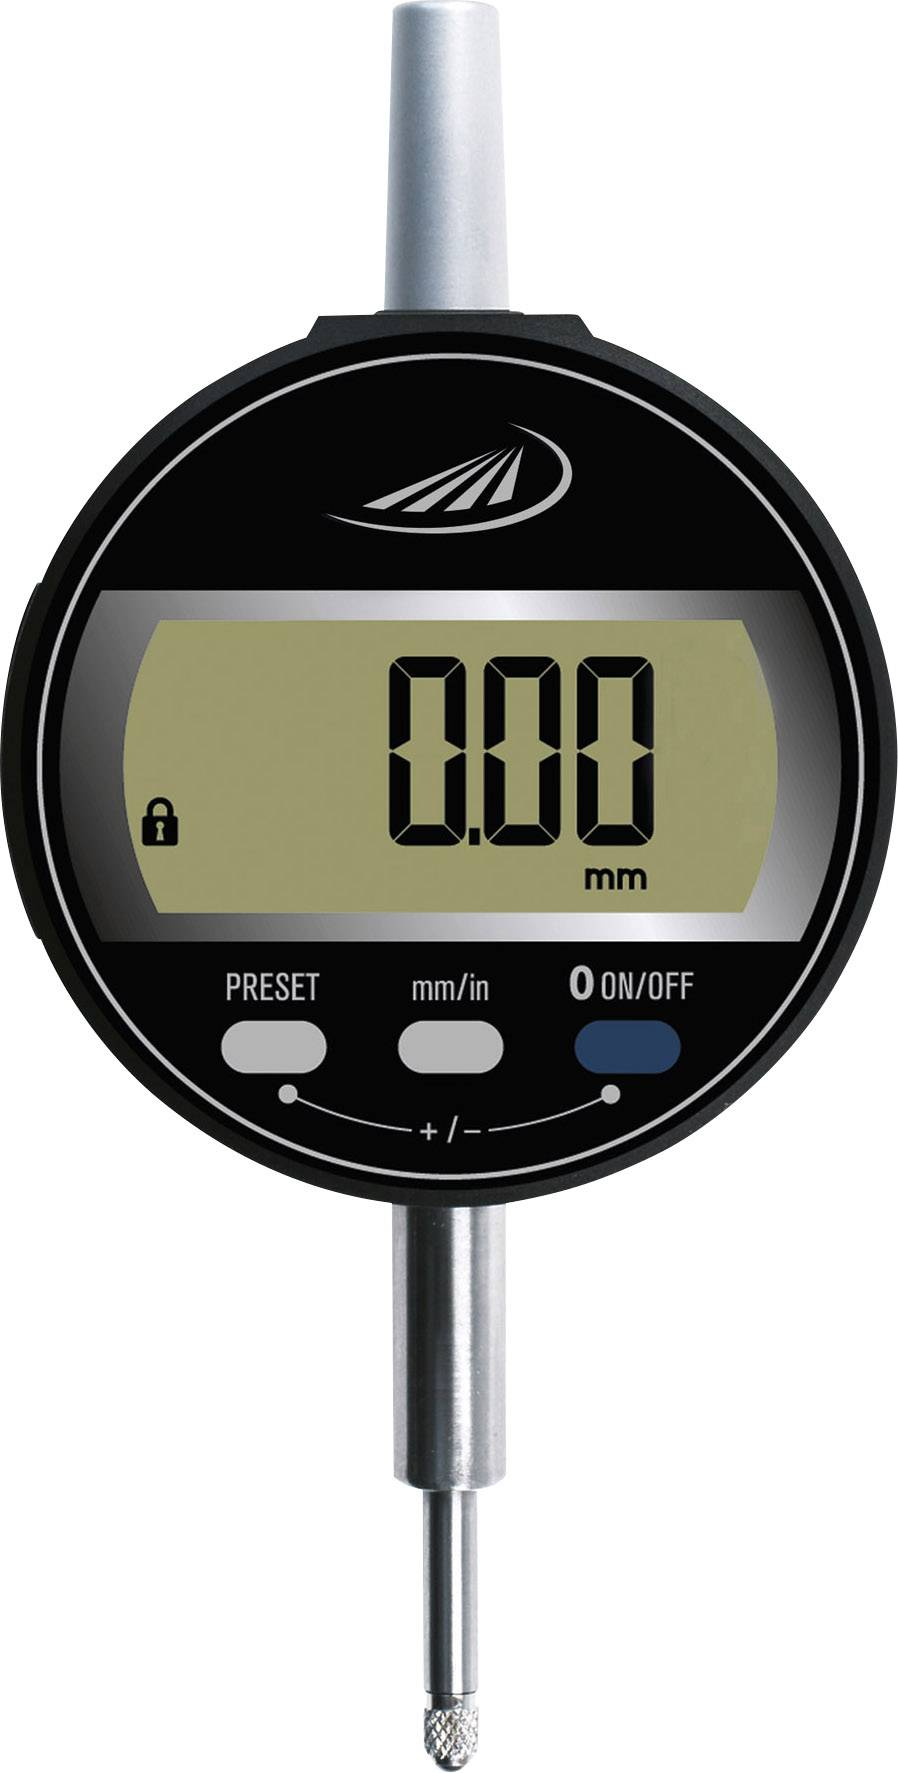 Digitálne meradlo Helios Preisser 1722 502, 0.01 mm